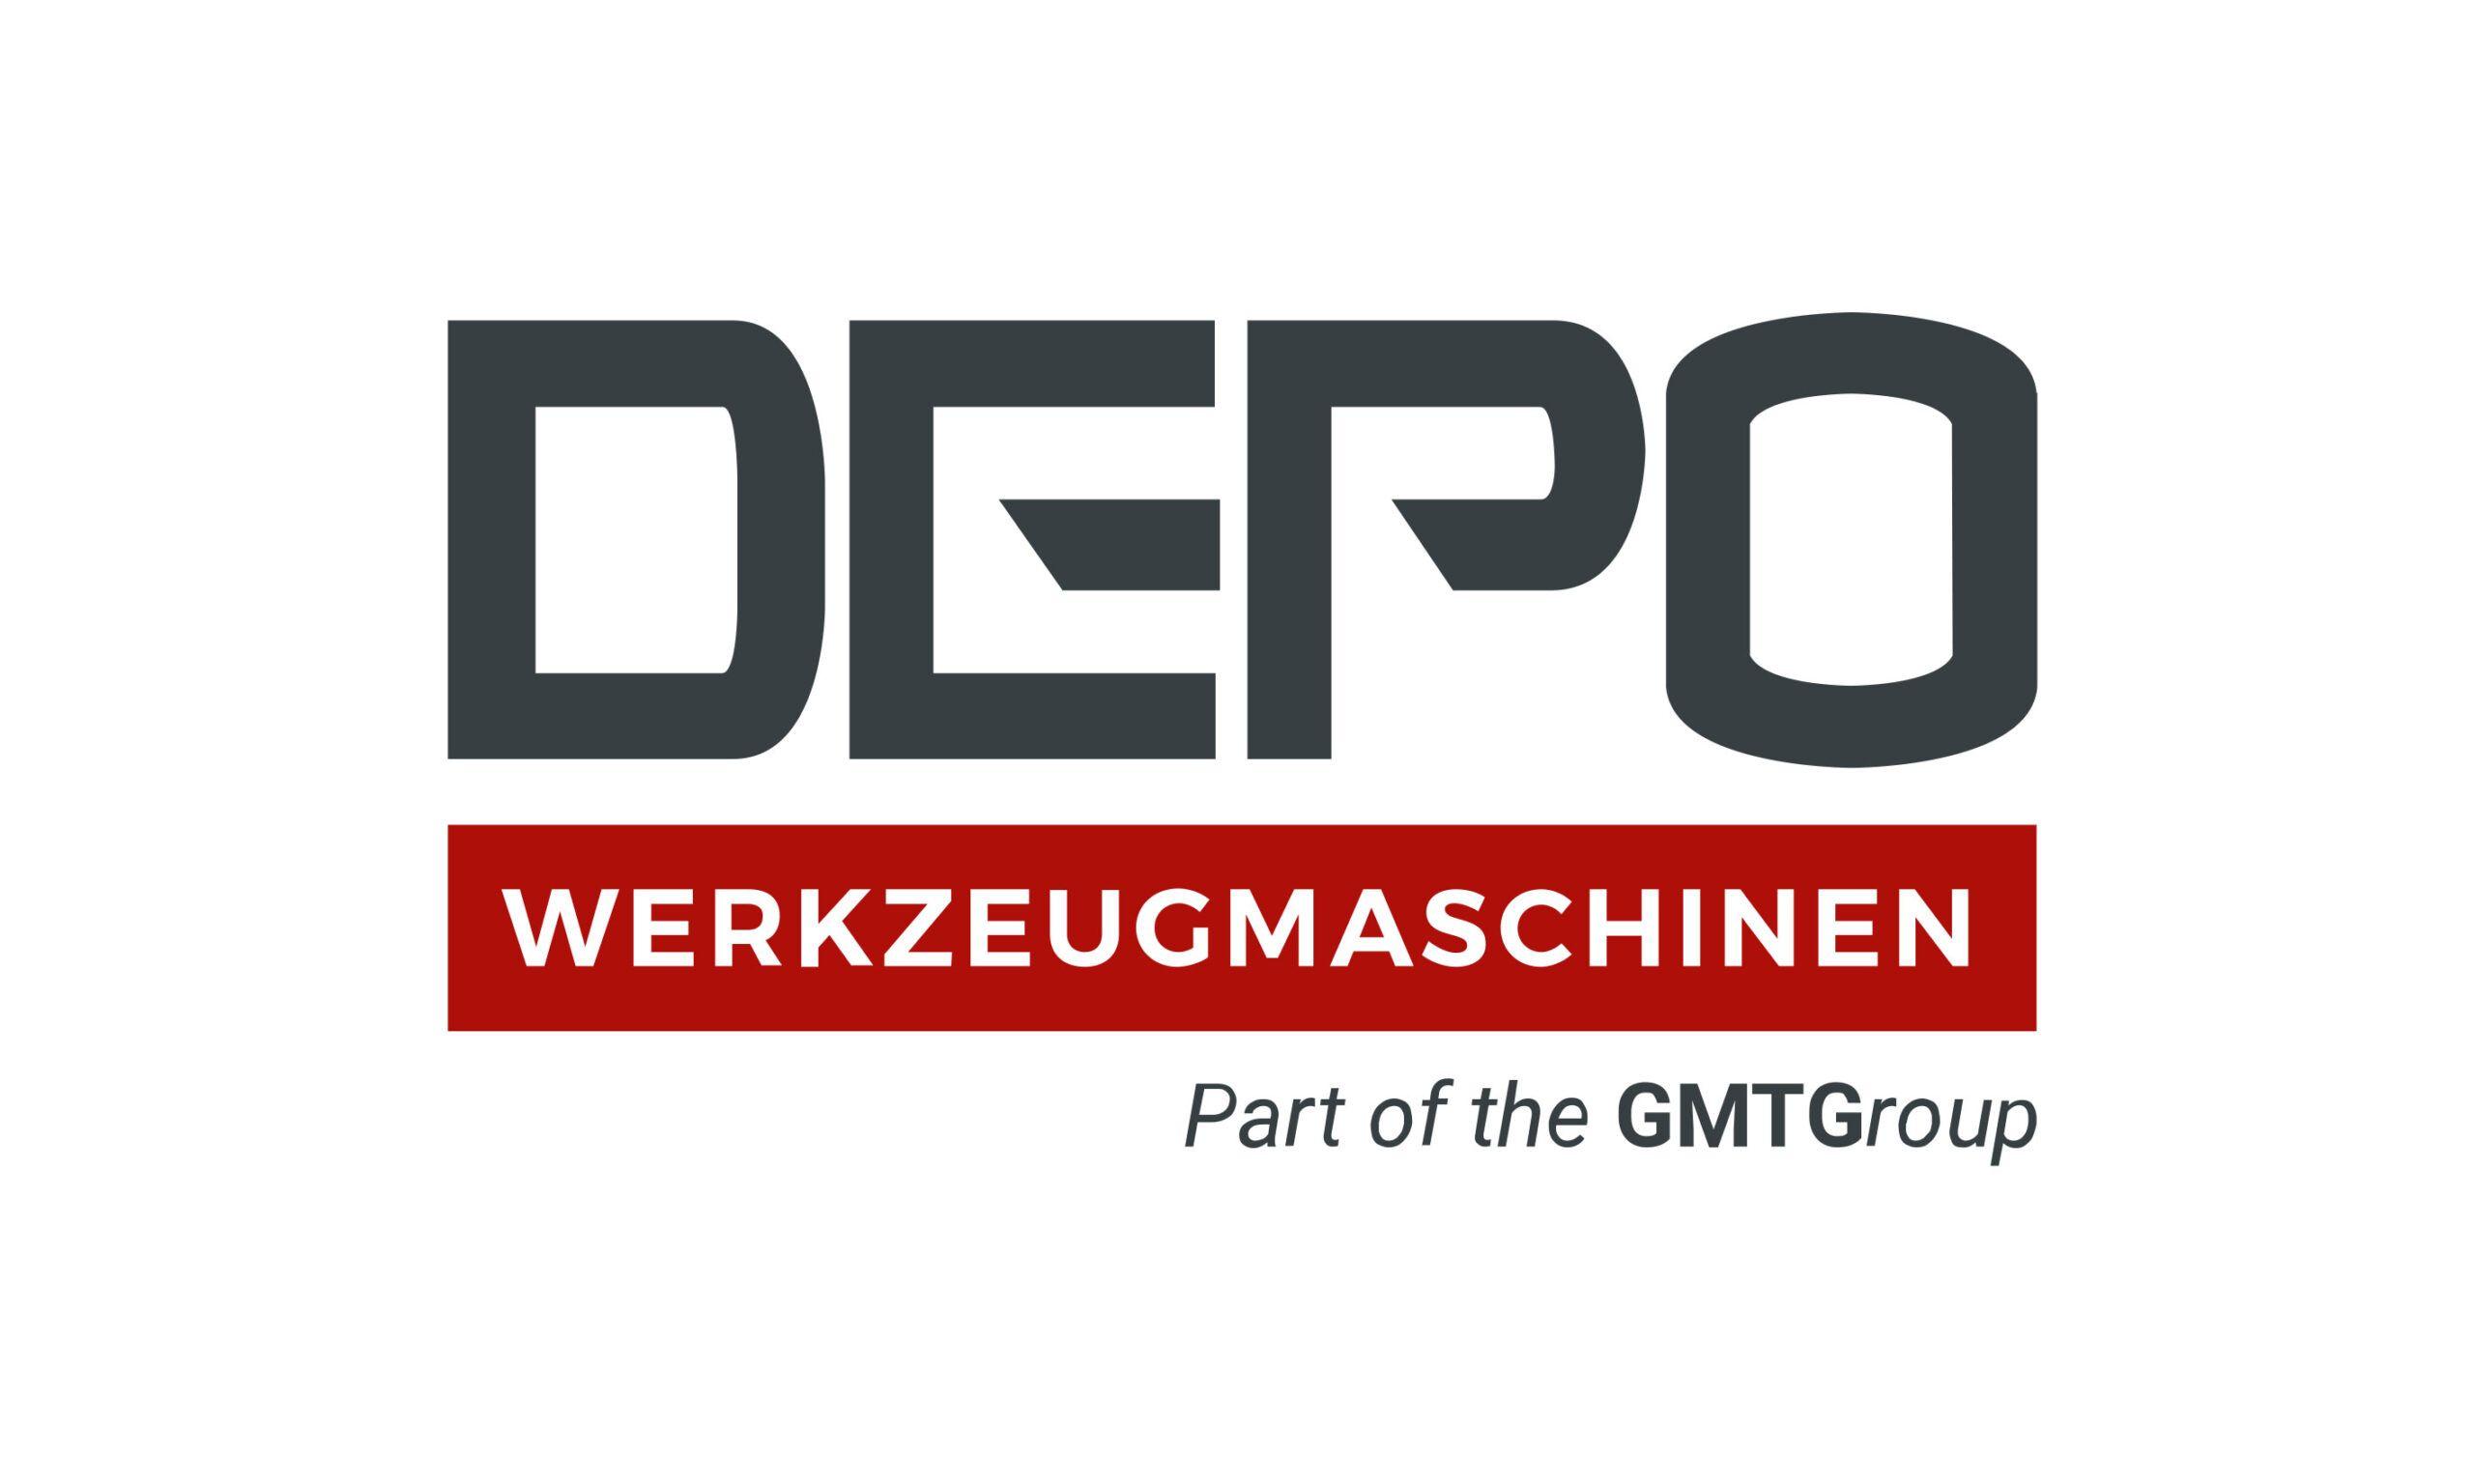 Convertero Werkzeugmaschinen DEPO